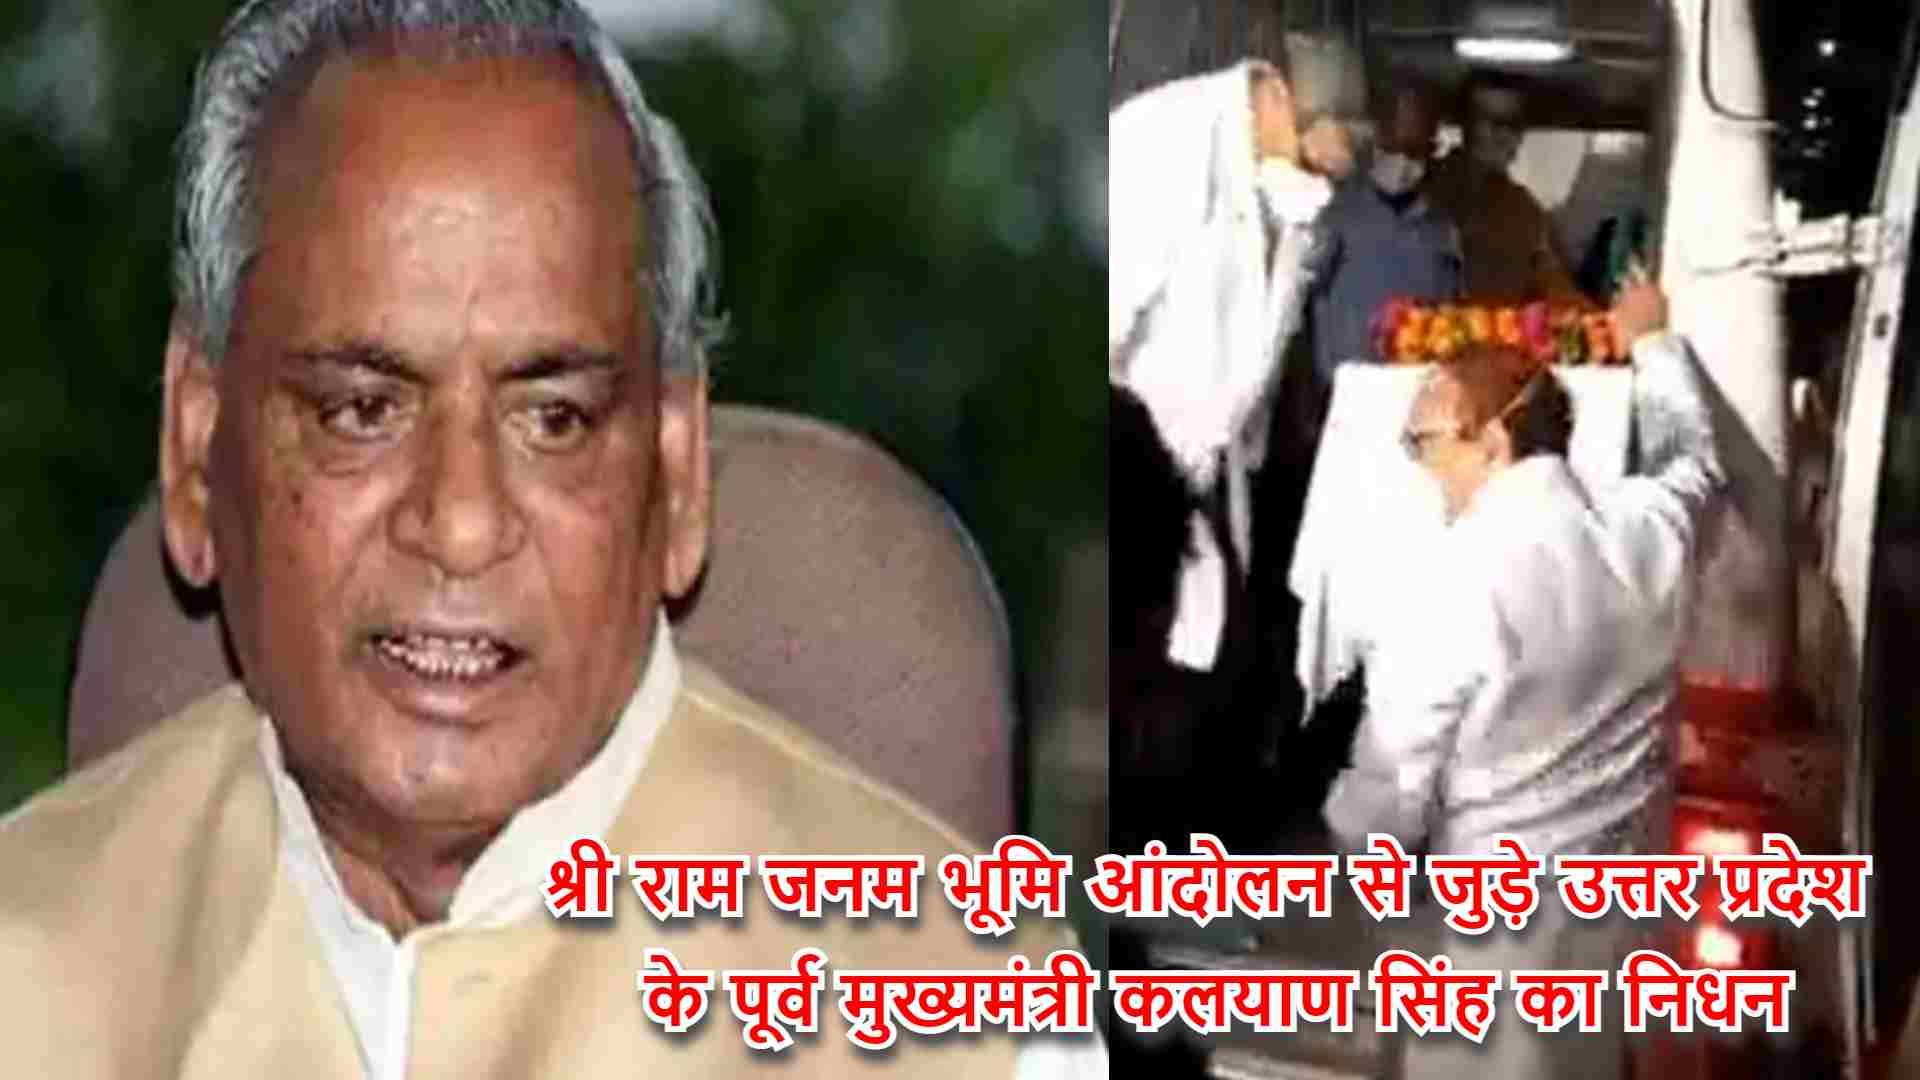 Former Uttar Pradesh Chief Minister Kalyan Singh associated with Shri Ram Janam Bhoomi movement passed away